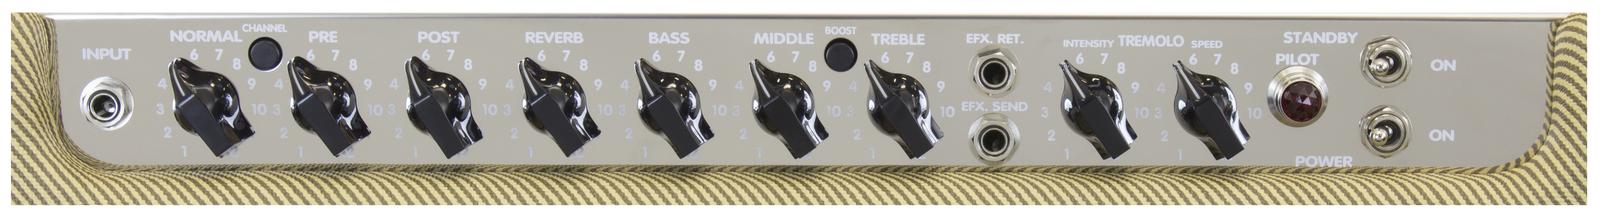 "PVDELTABLUES210 7 - Peavey Classic Series ""Delta Blues 210"" Guitar Amp Combo 30-Watt 2x10"""